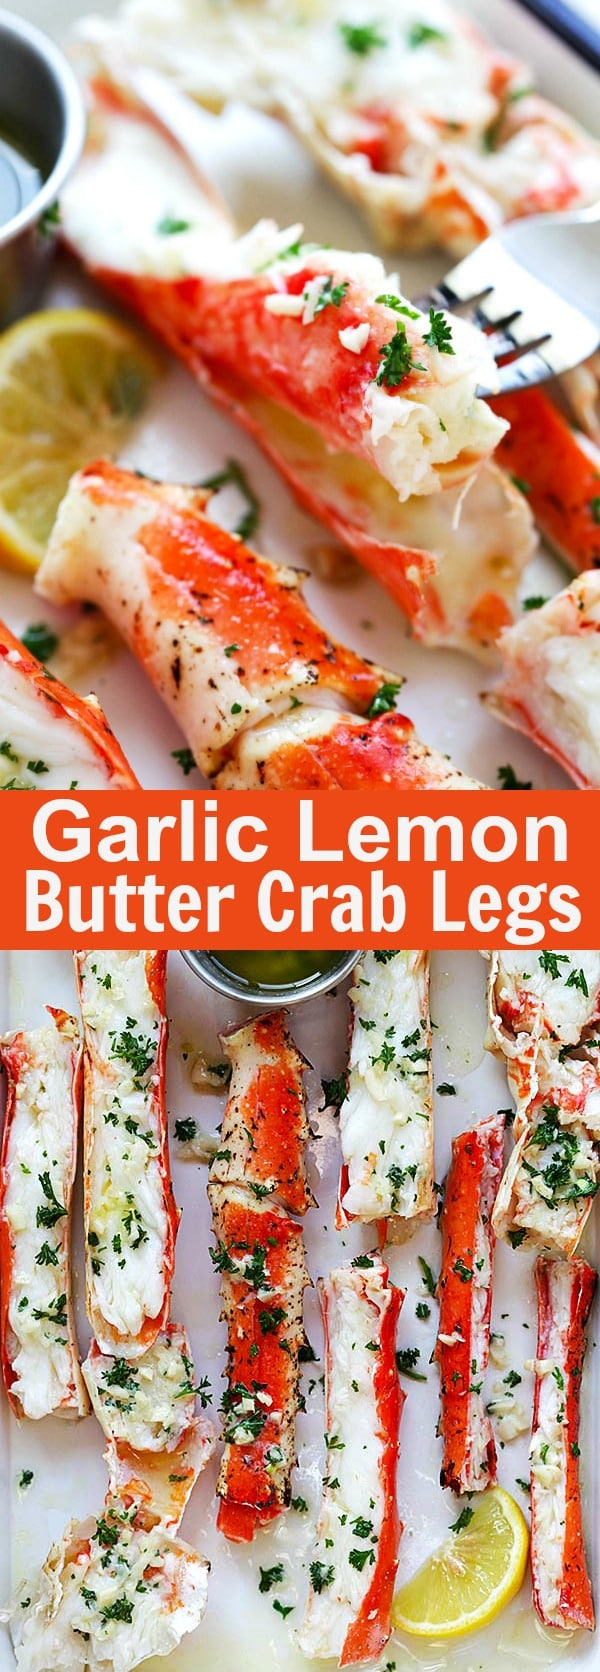 Garlic Lemon Butter Crab Legs – crazy delicious king crab legs in garlic herb and lemon butter. This crab legs recipe is so good